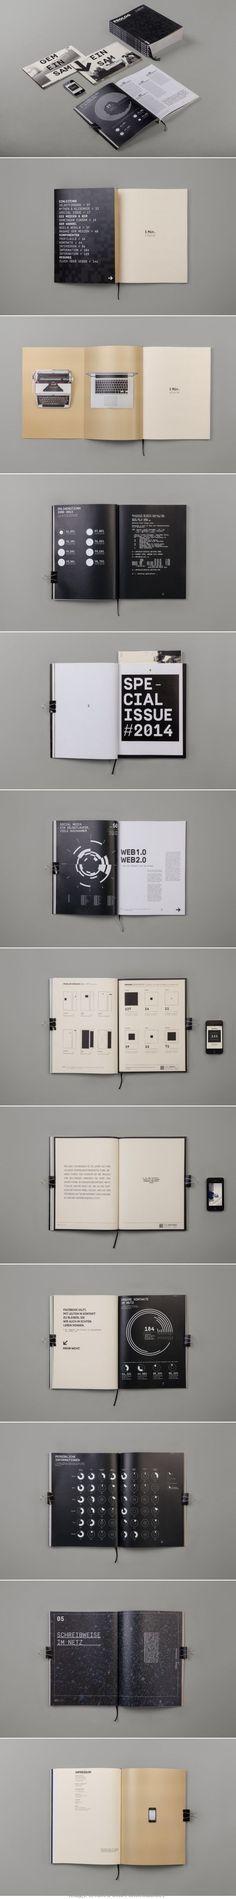 Prolog – Magazin der digitalen Kultur